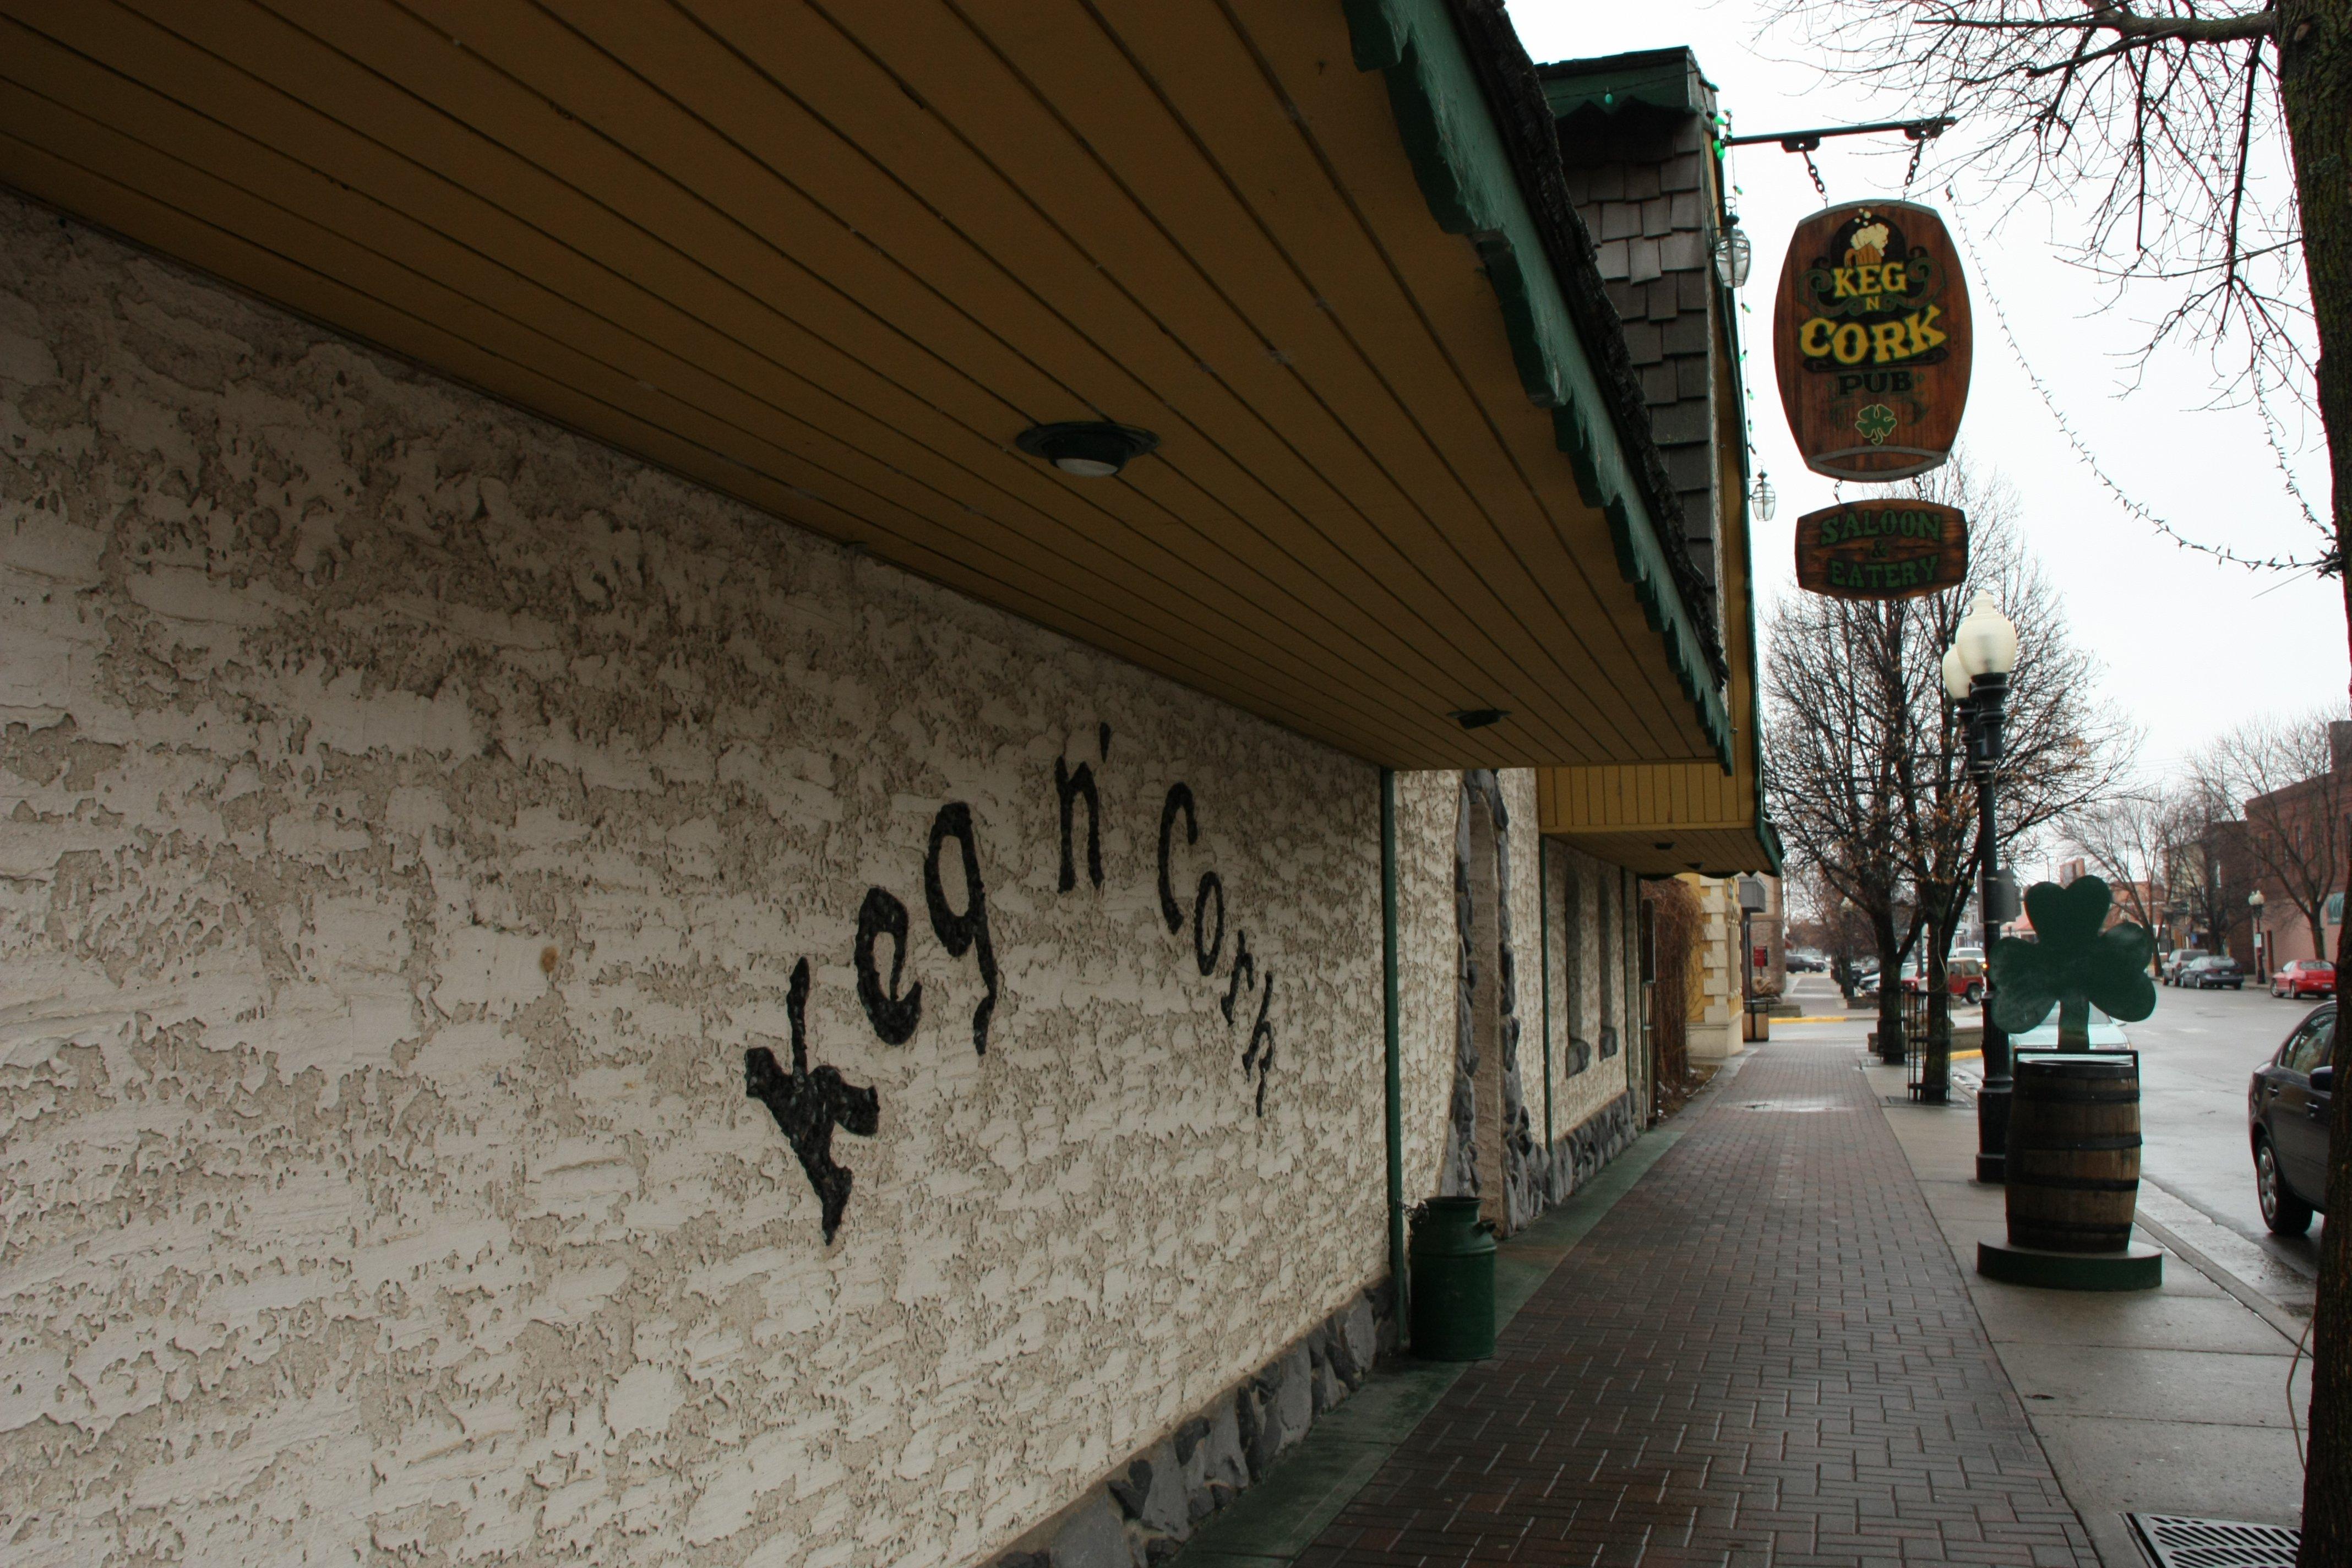 Keg n' Cork Store front